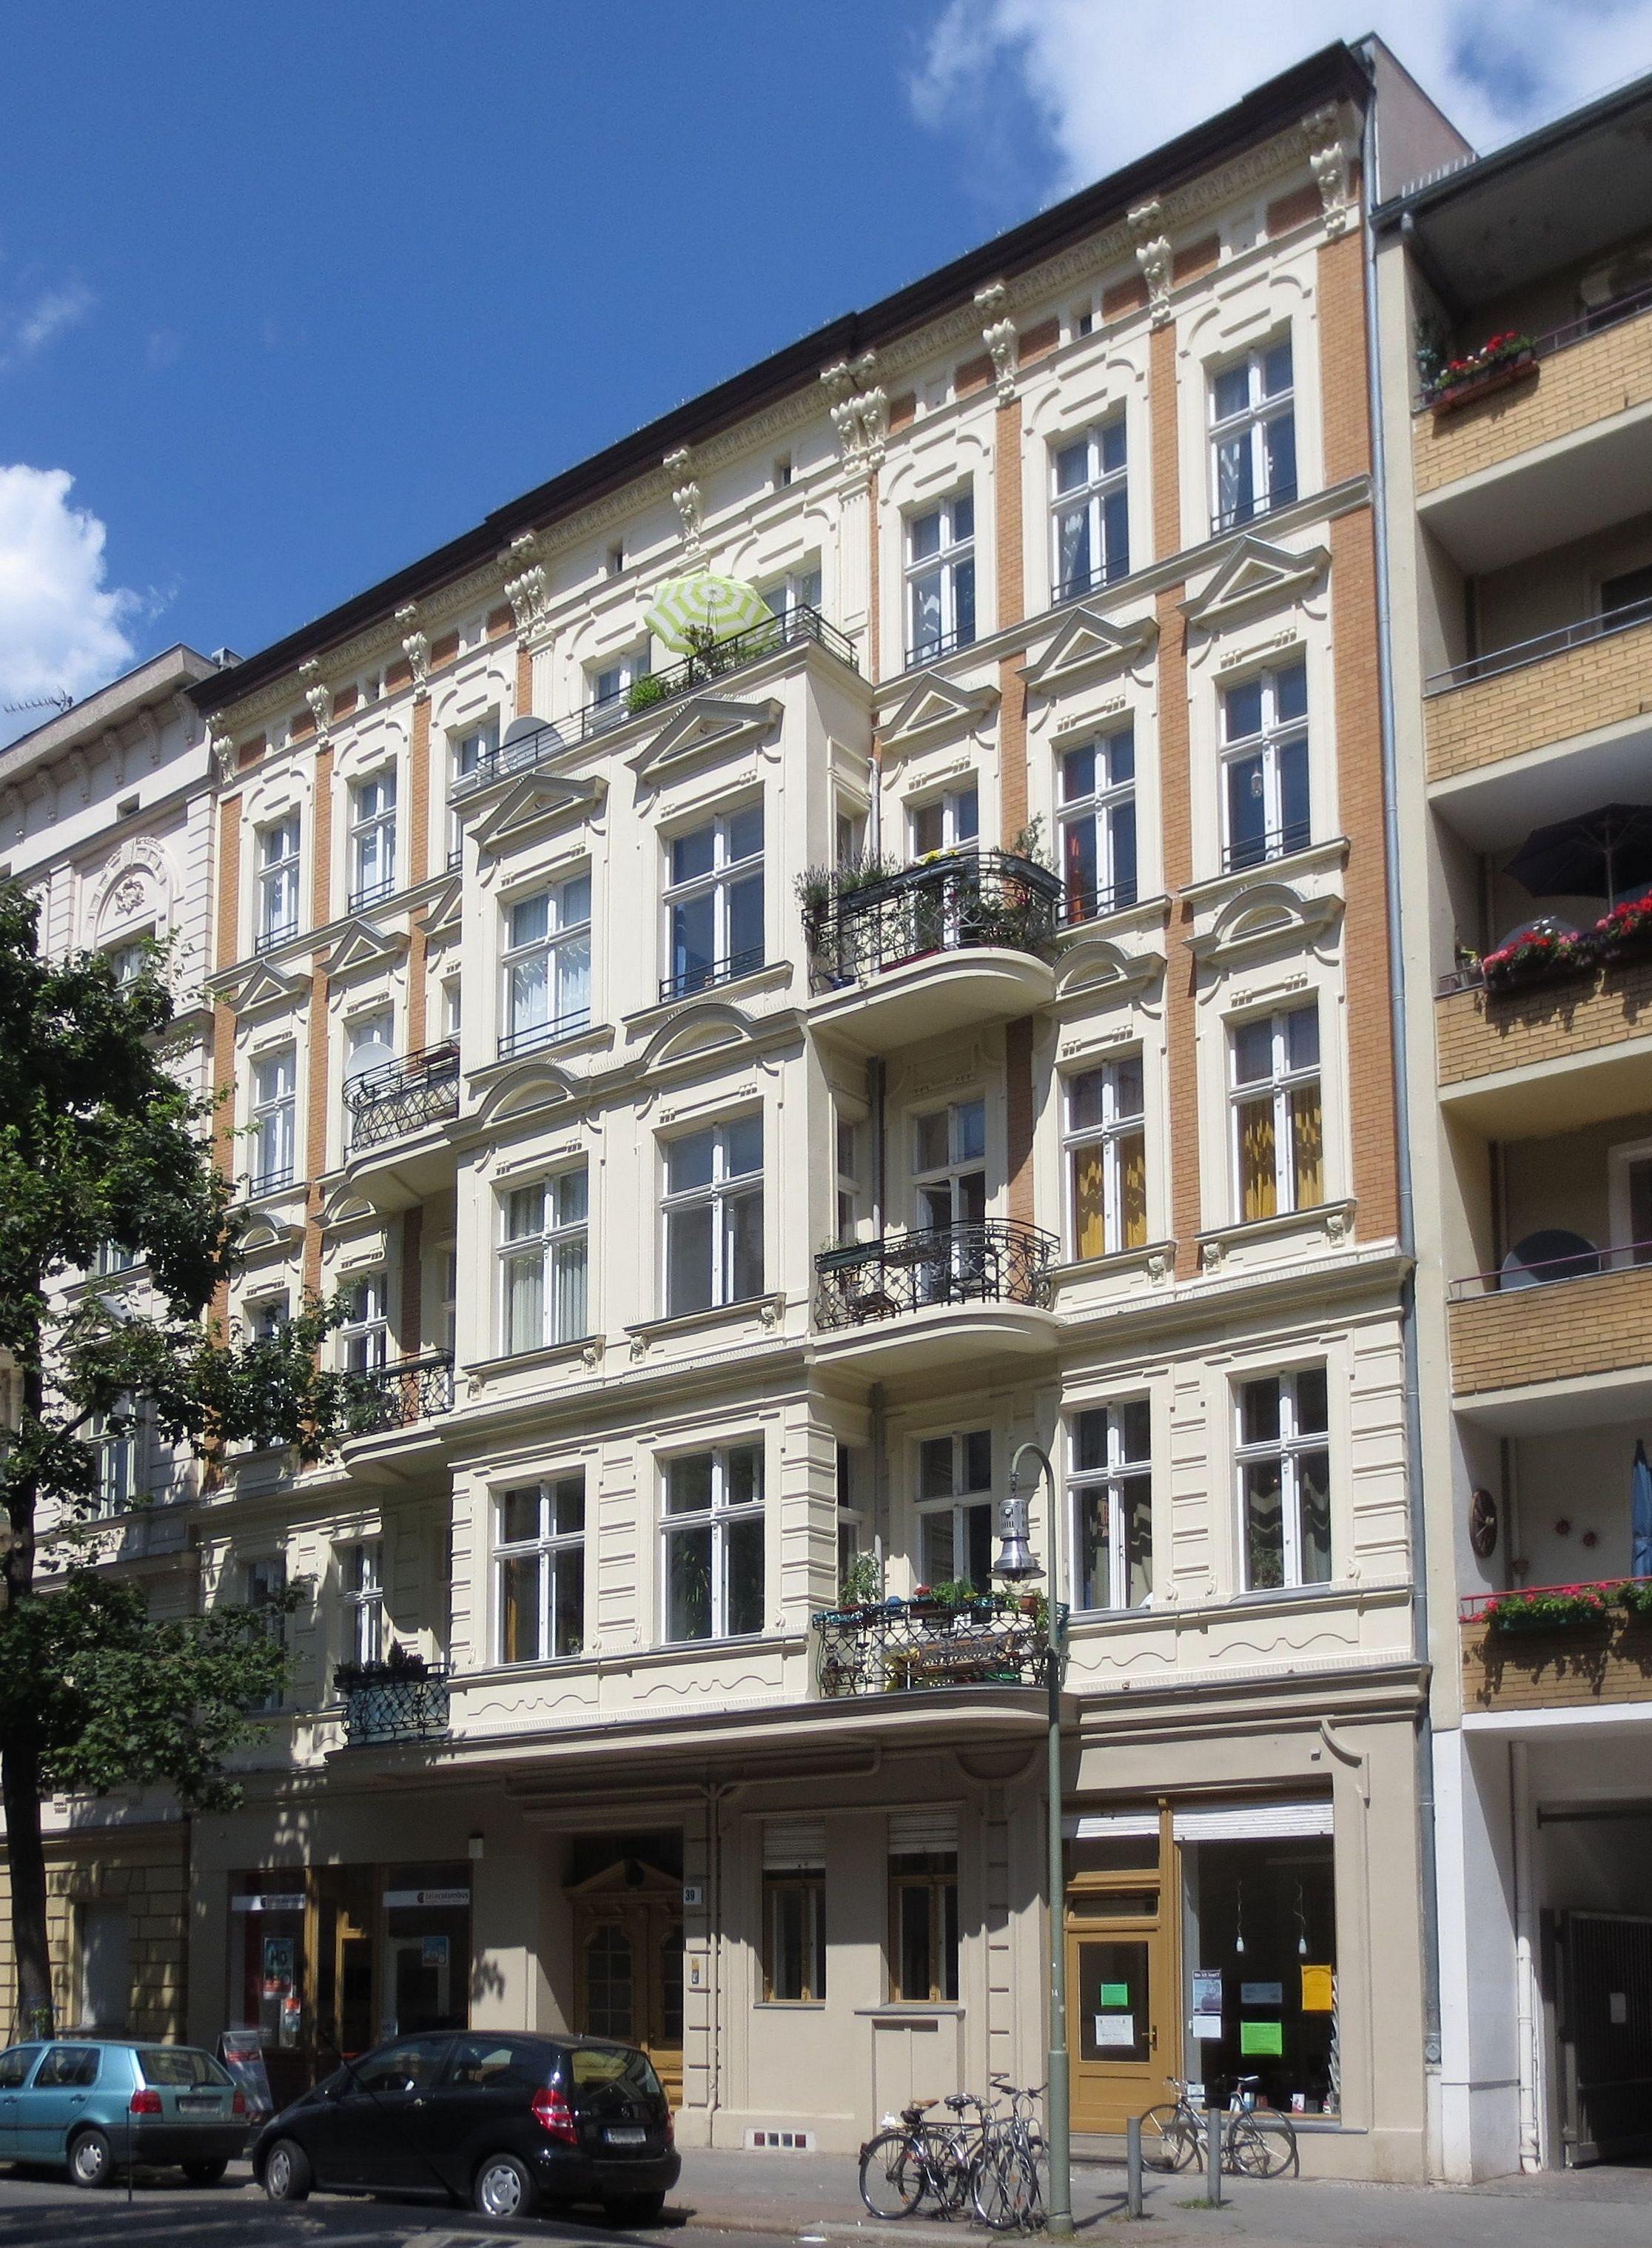 file berlin schoeneberg grossgoerschenstrasse 39 wikimedia commons. Black Bedroom Furniture Sets. Home Design Ideas